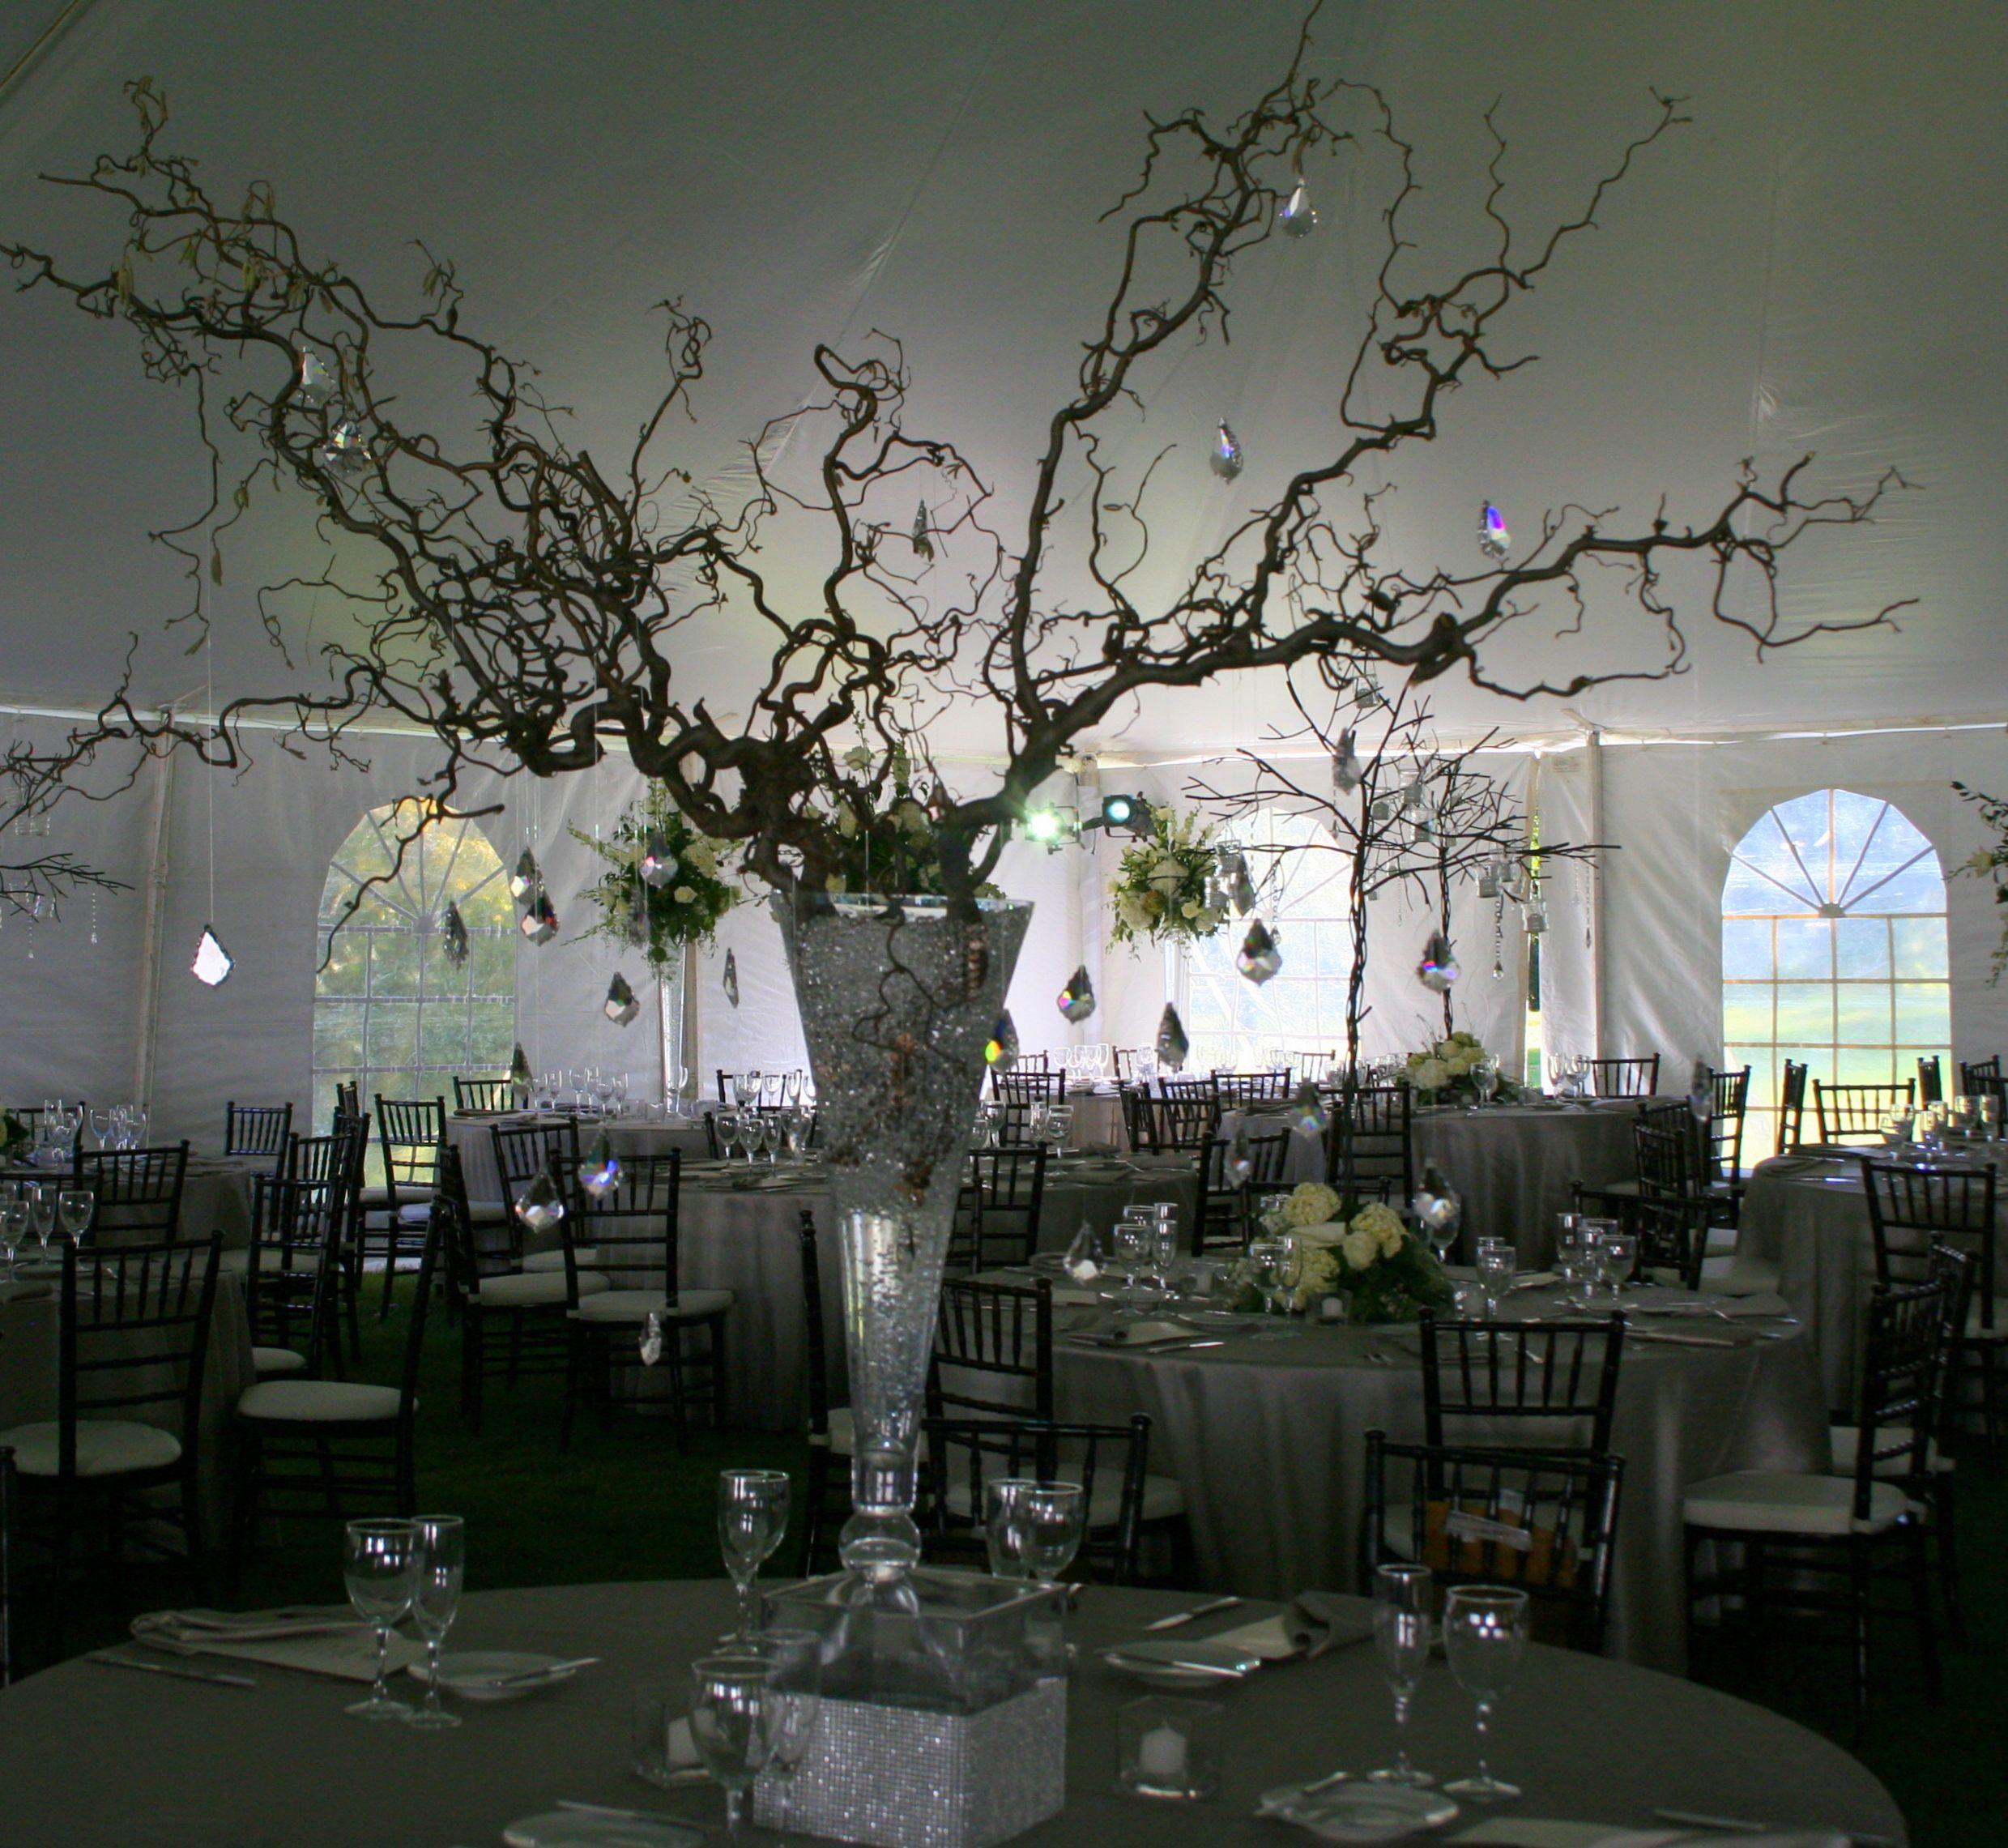 Beach wedding venues in san diego  beautiful and elegant with the crystal ornaments  Wedding Decor